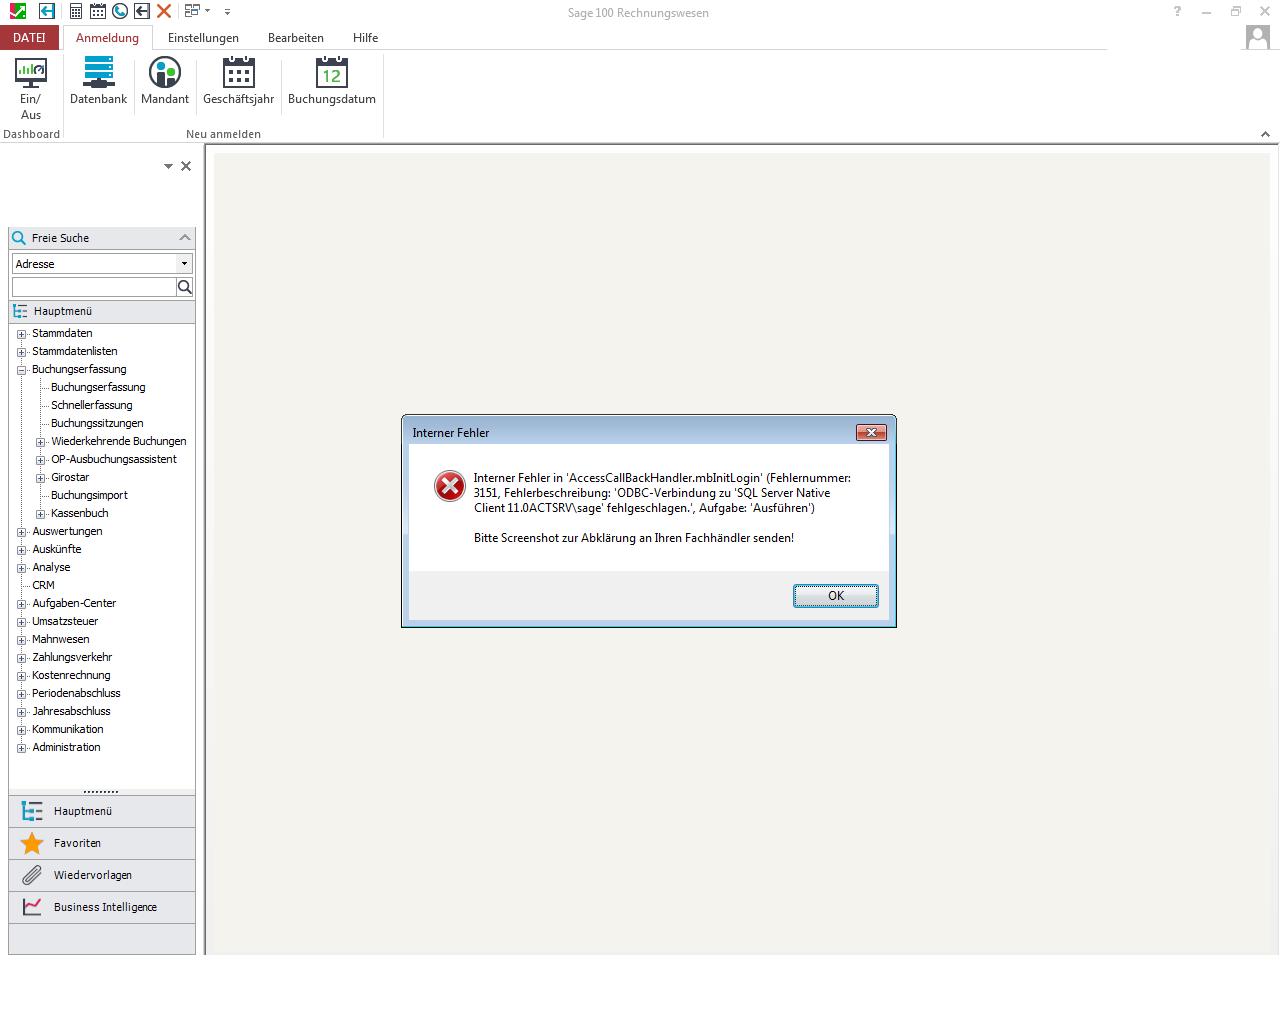 Sage 100 Problem Fehler ODCB Fehlermeldung SQL-Server Client